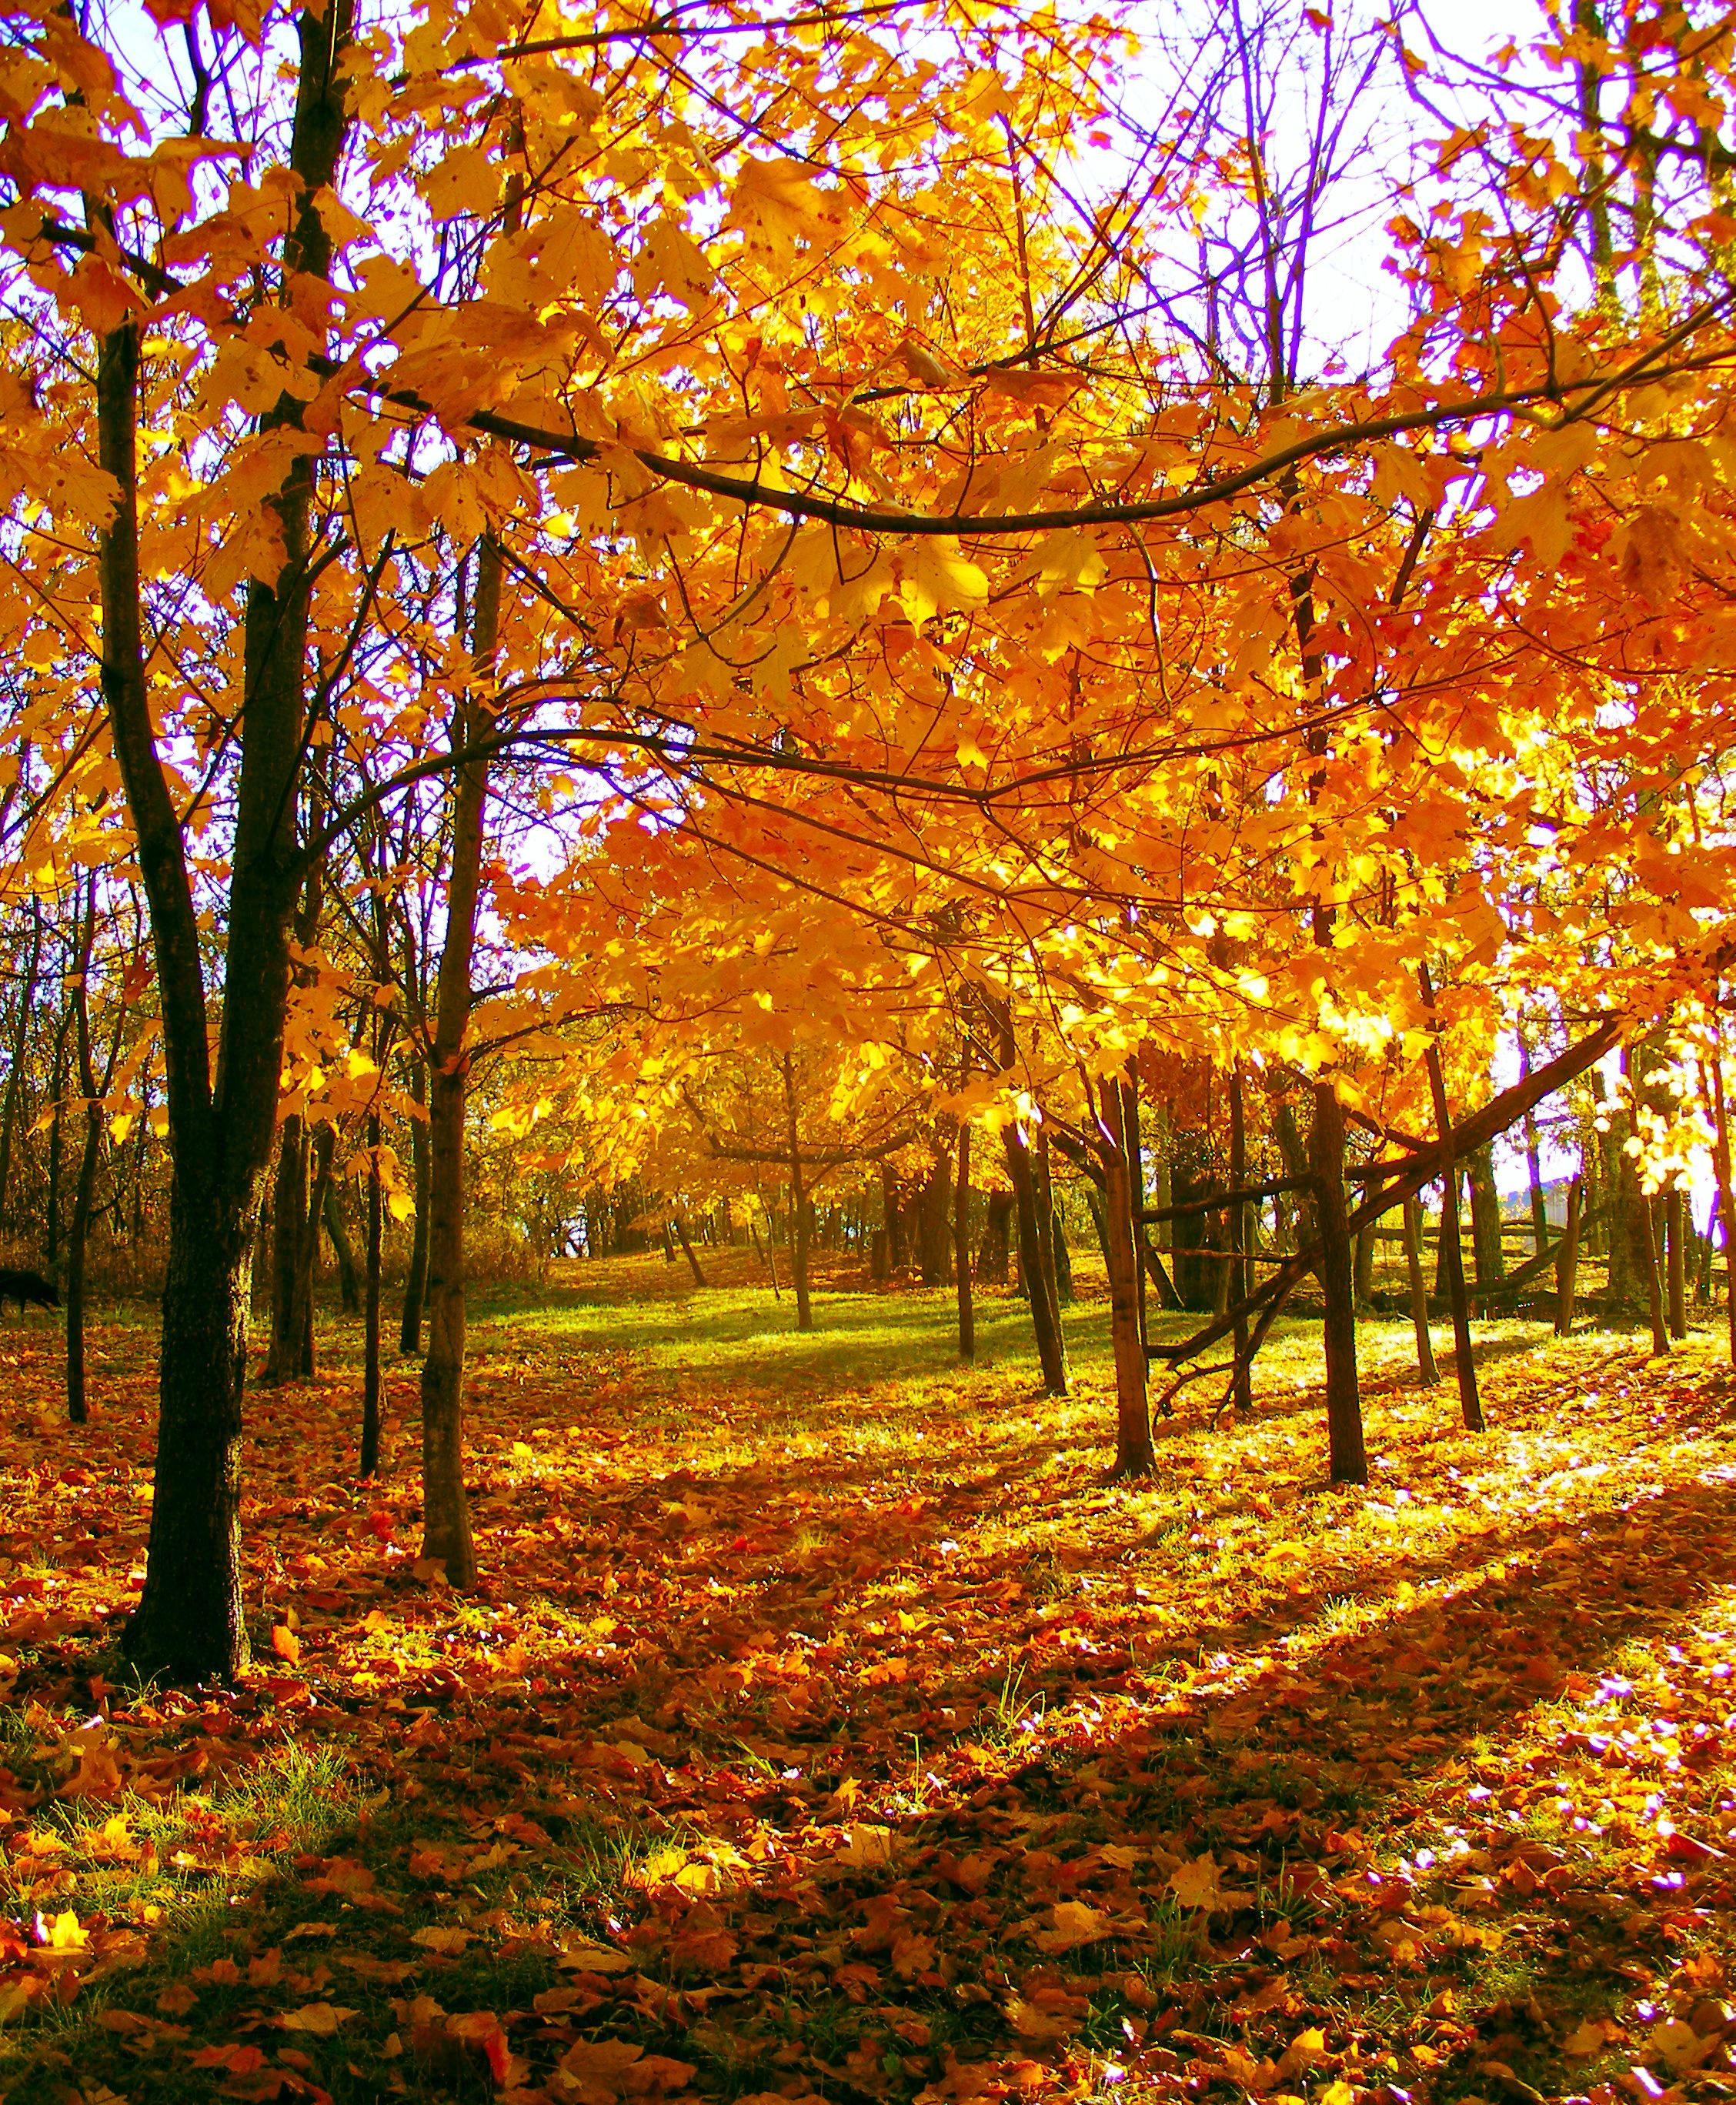 Fall Autumn Tree Leaves Nature